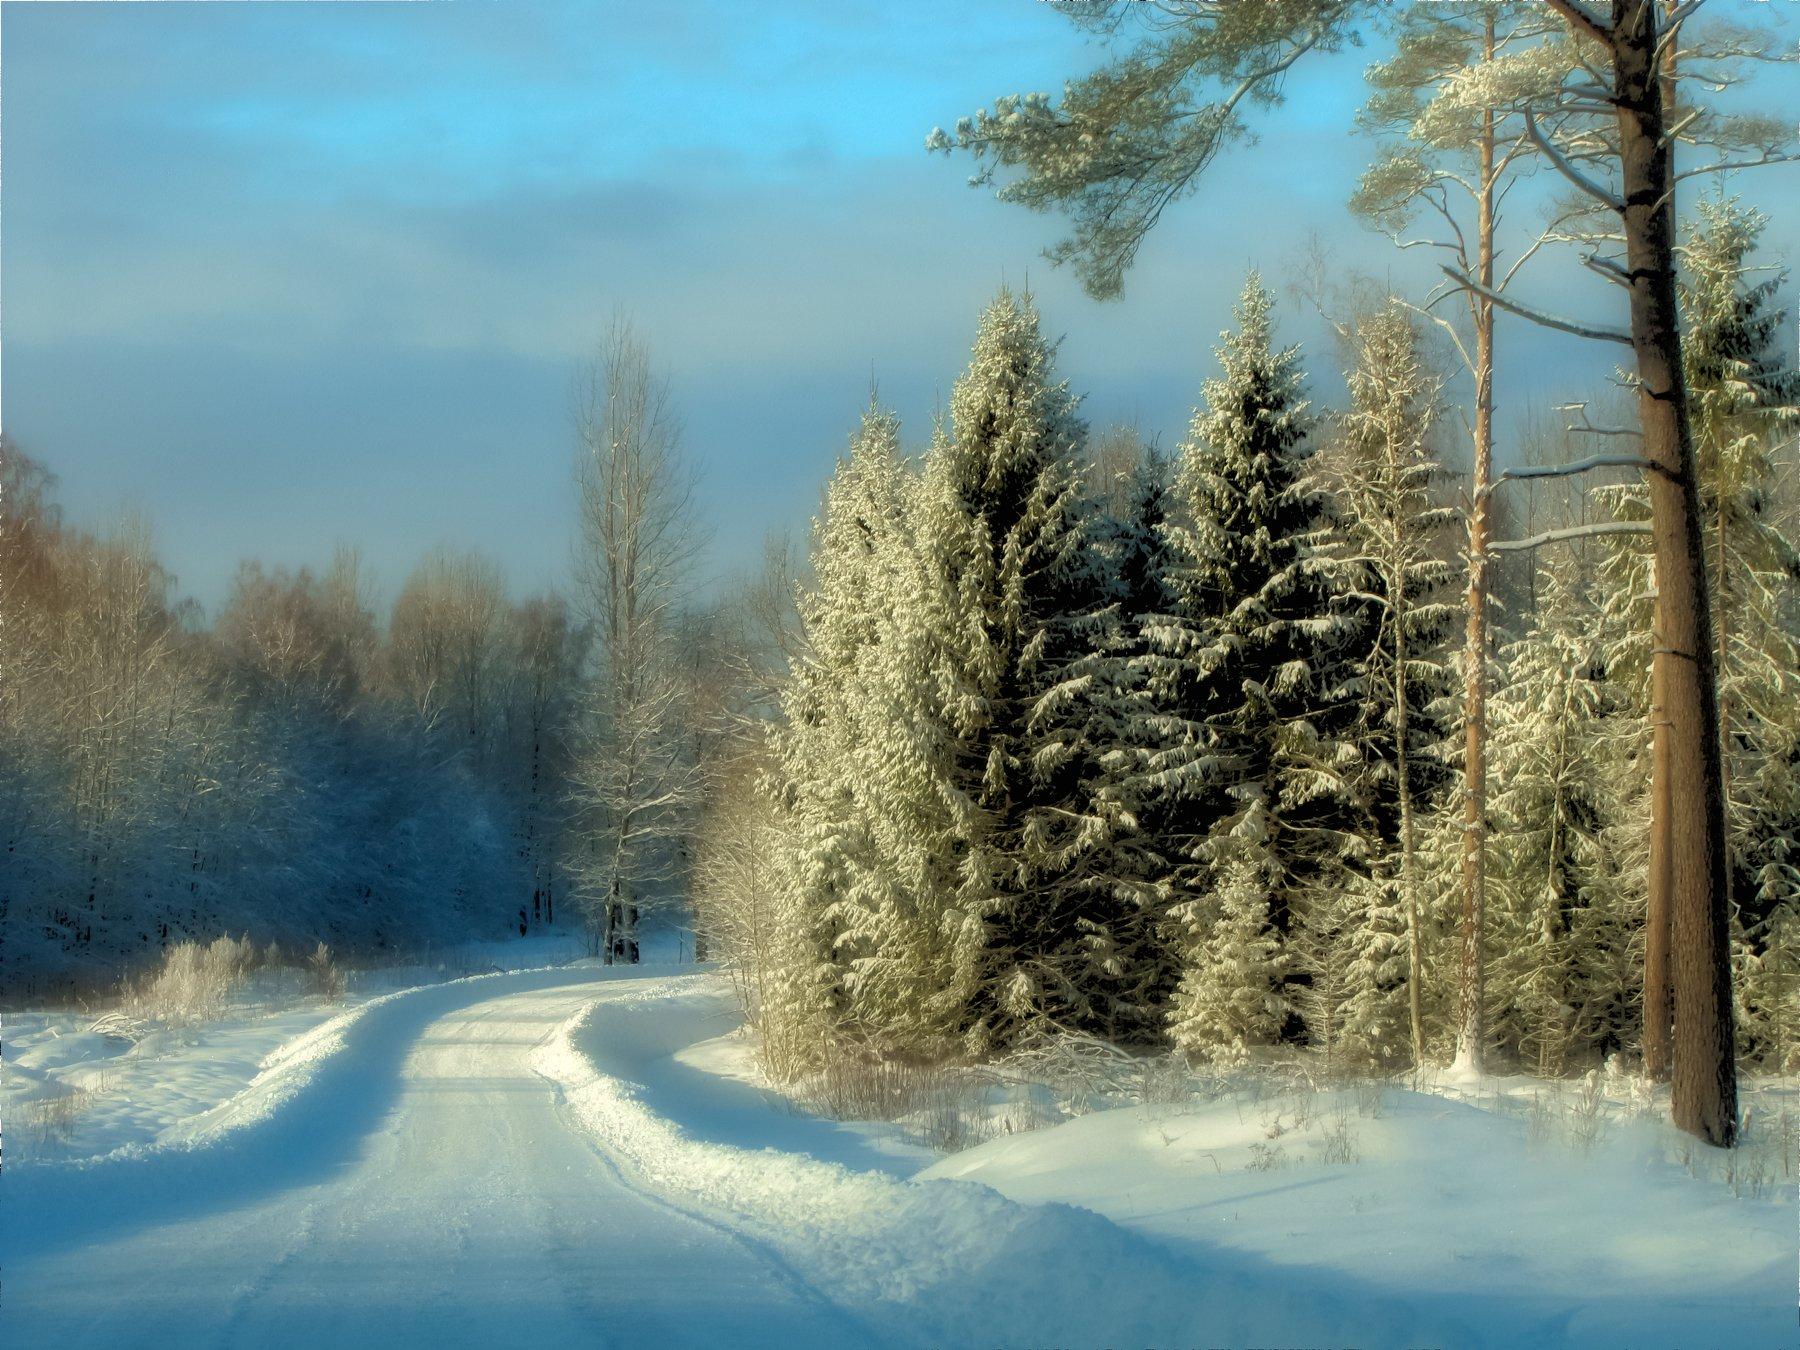 winter, day, foret, road, snow, spruces, trees, sun, blue, beautiful, , Dzintra Regina  Jansone